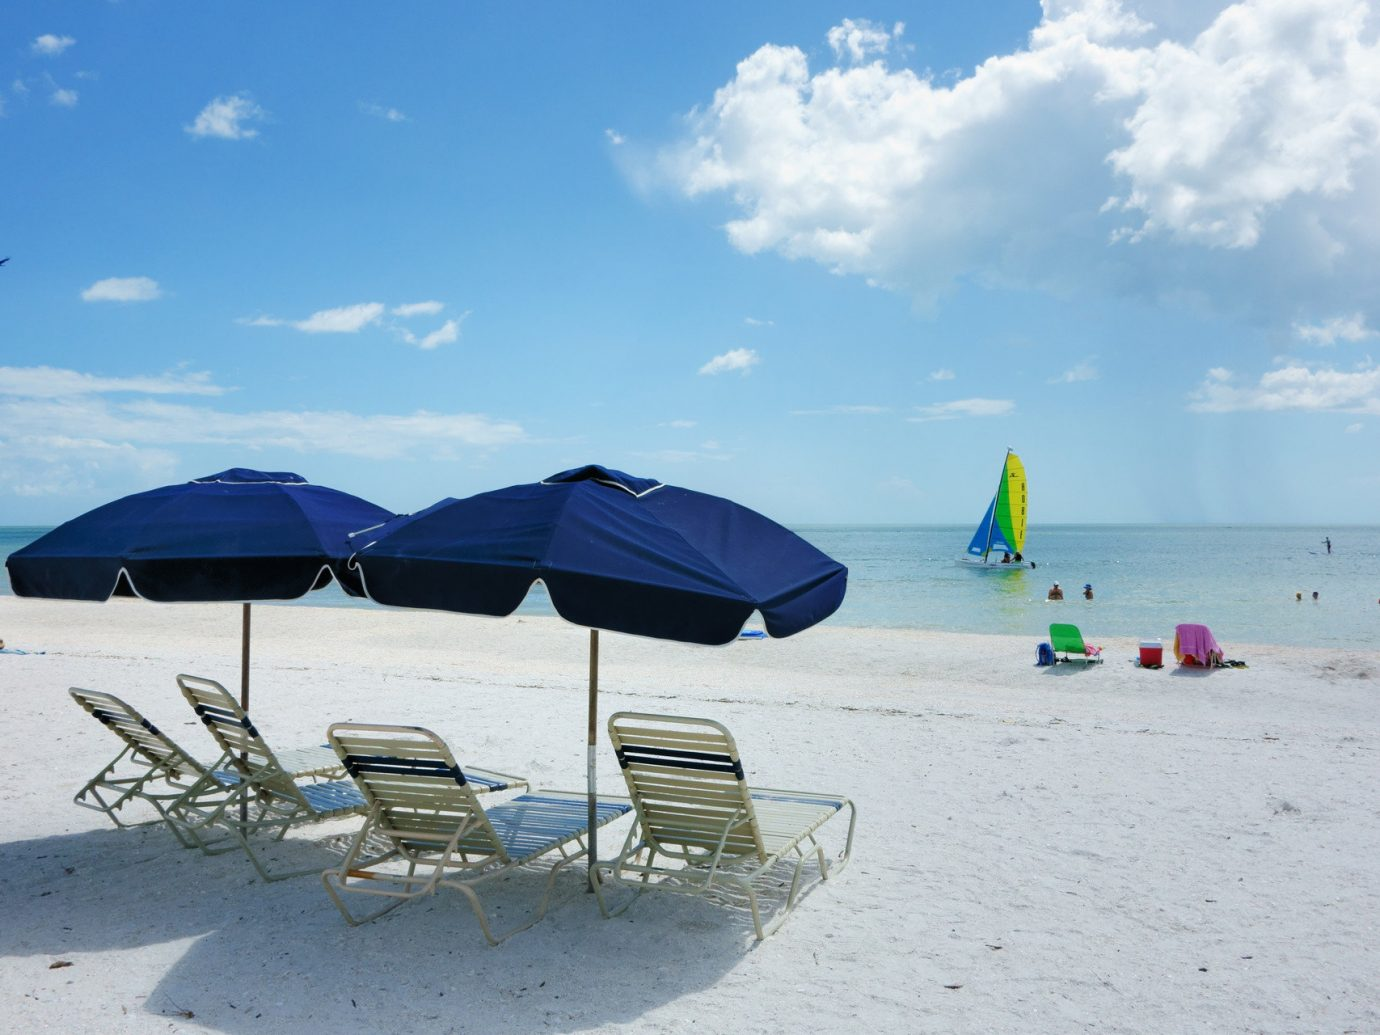 Trip Ideas sky outdoor Beach umbrella body of water Sea Ocean Nature shore vacation Coast bay sand wind day sandy several